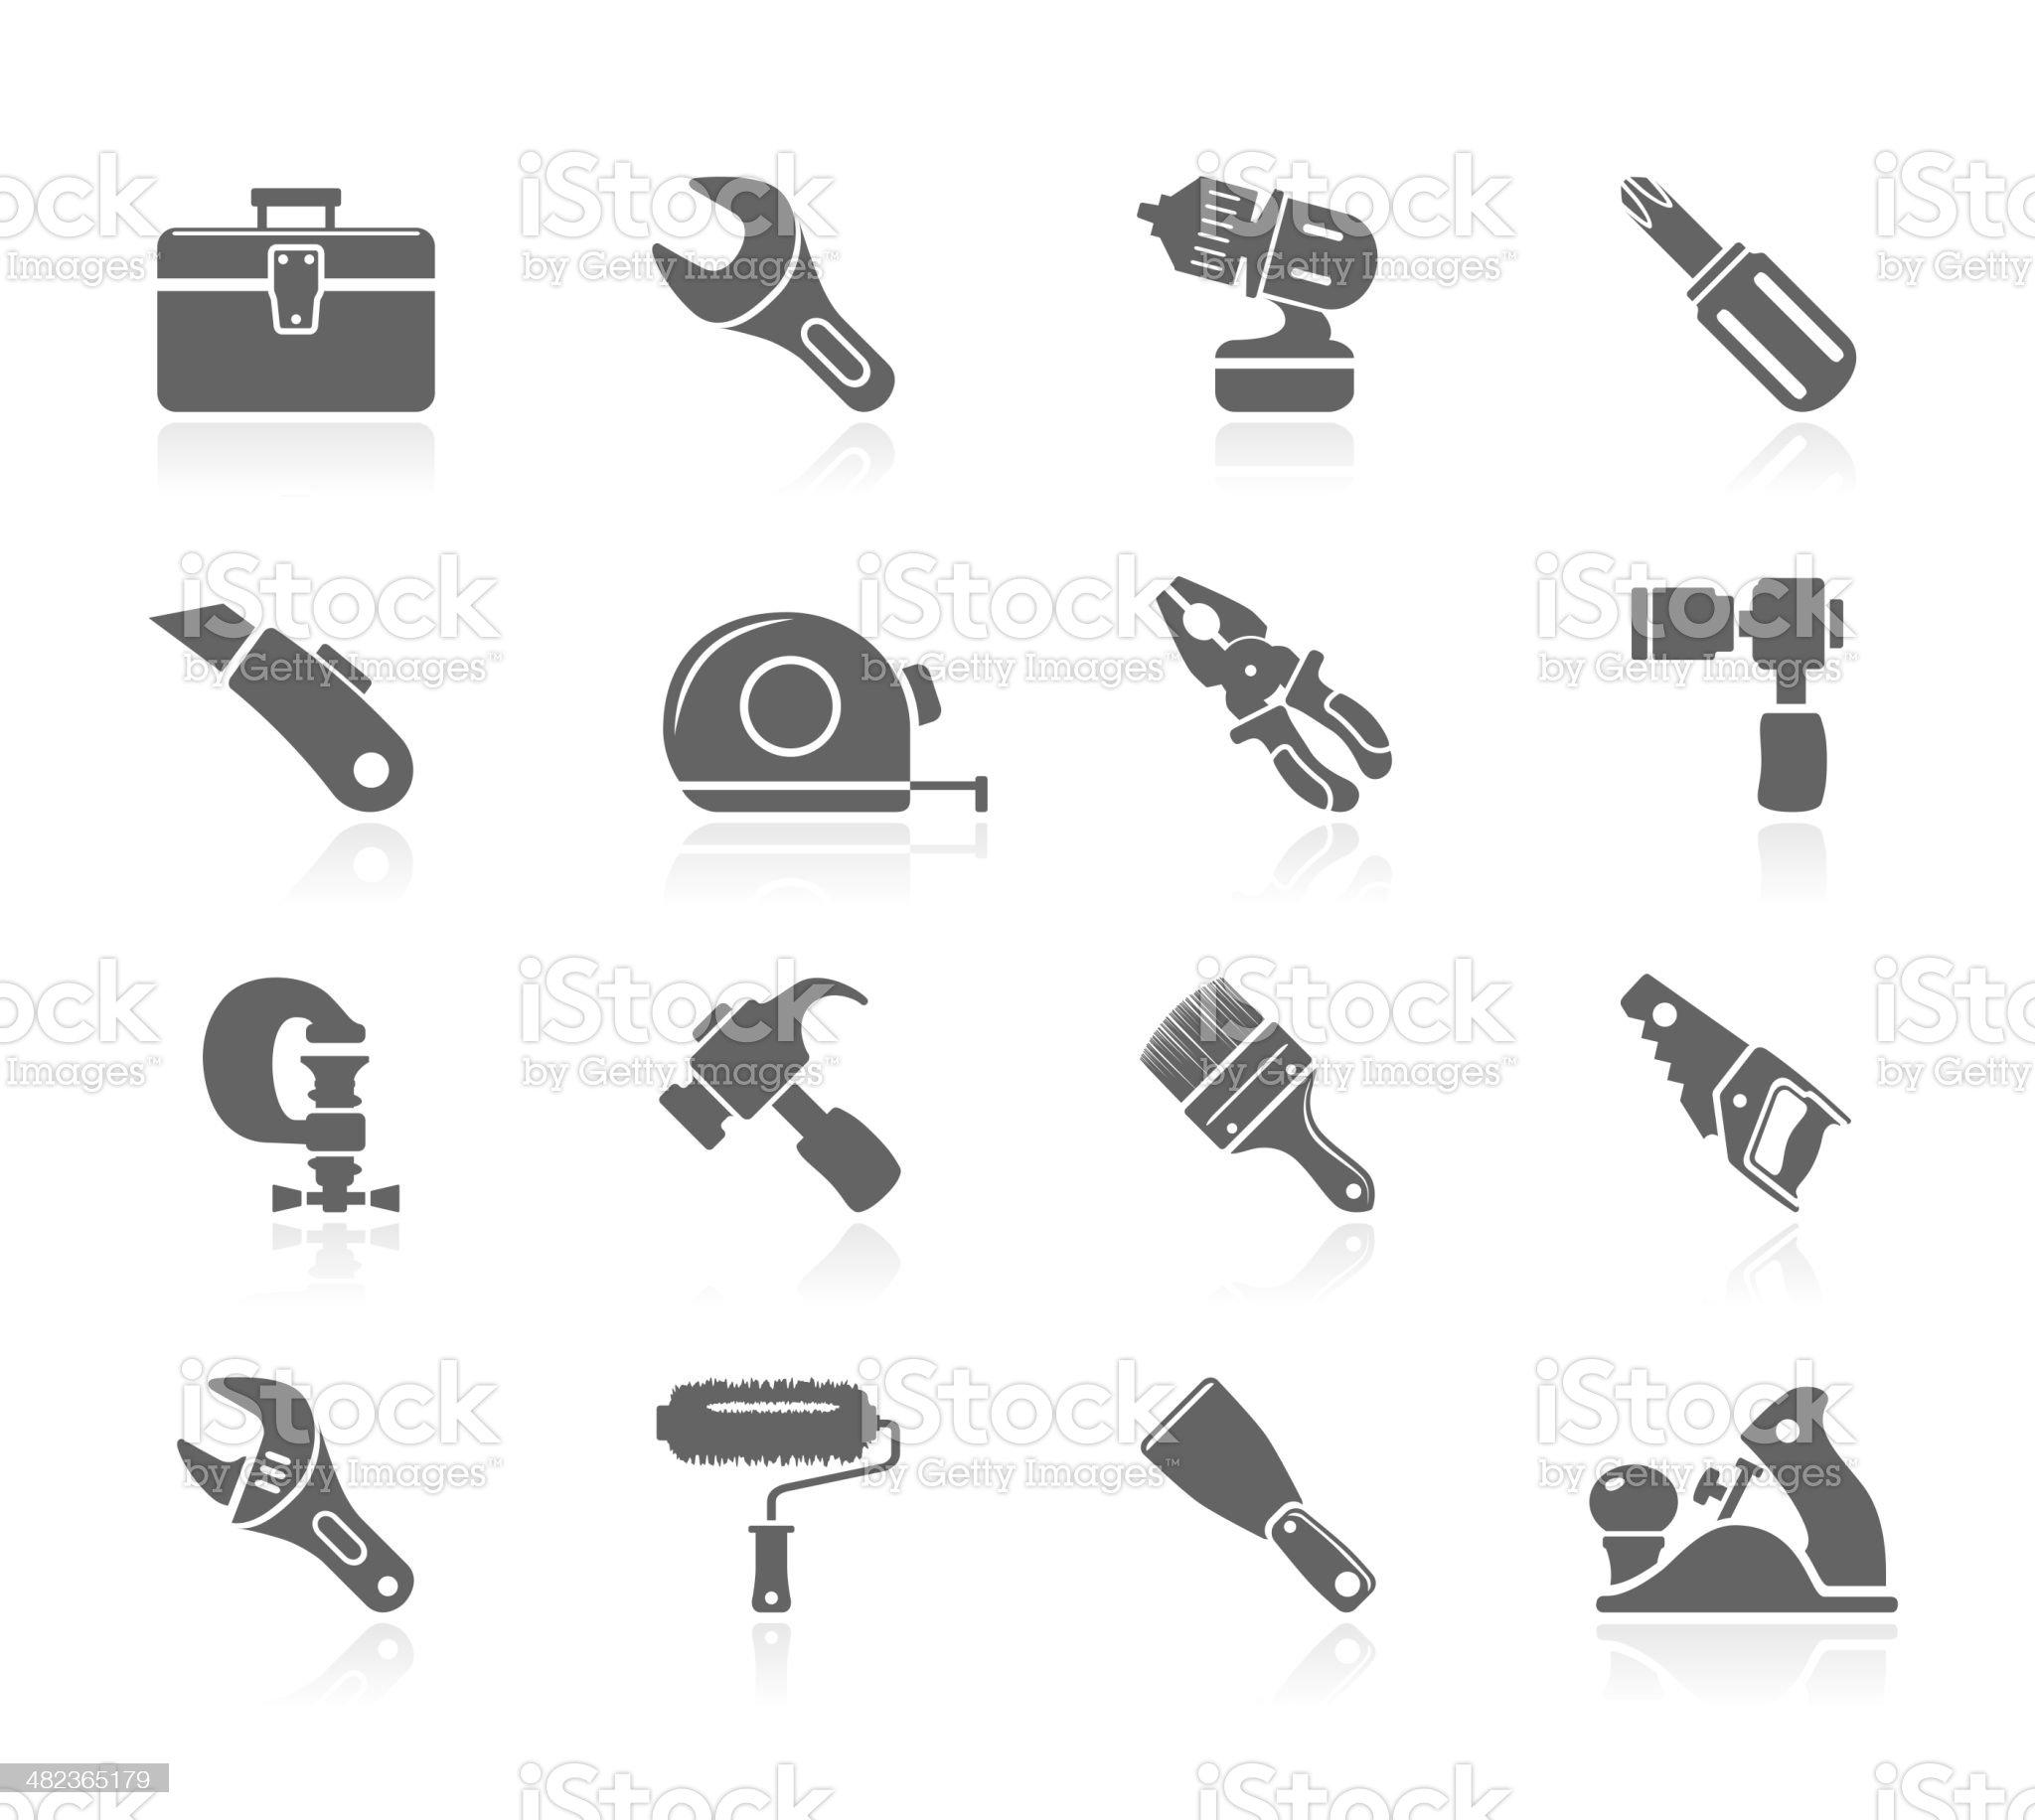 Black Icons - Tools royalty-free stock vector art